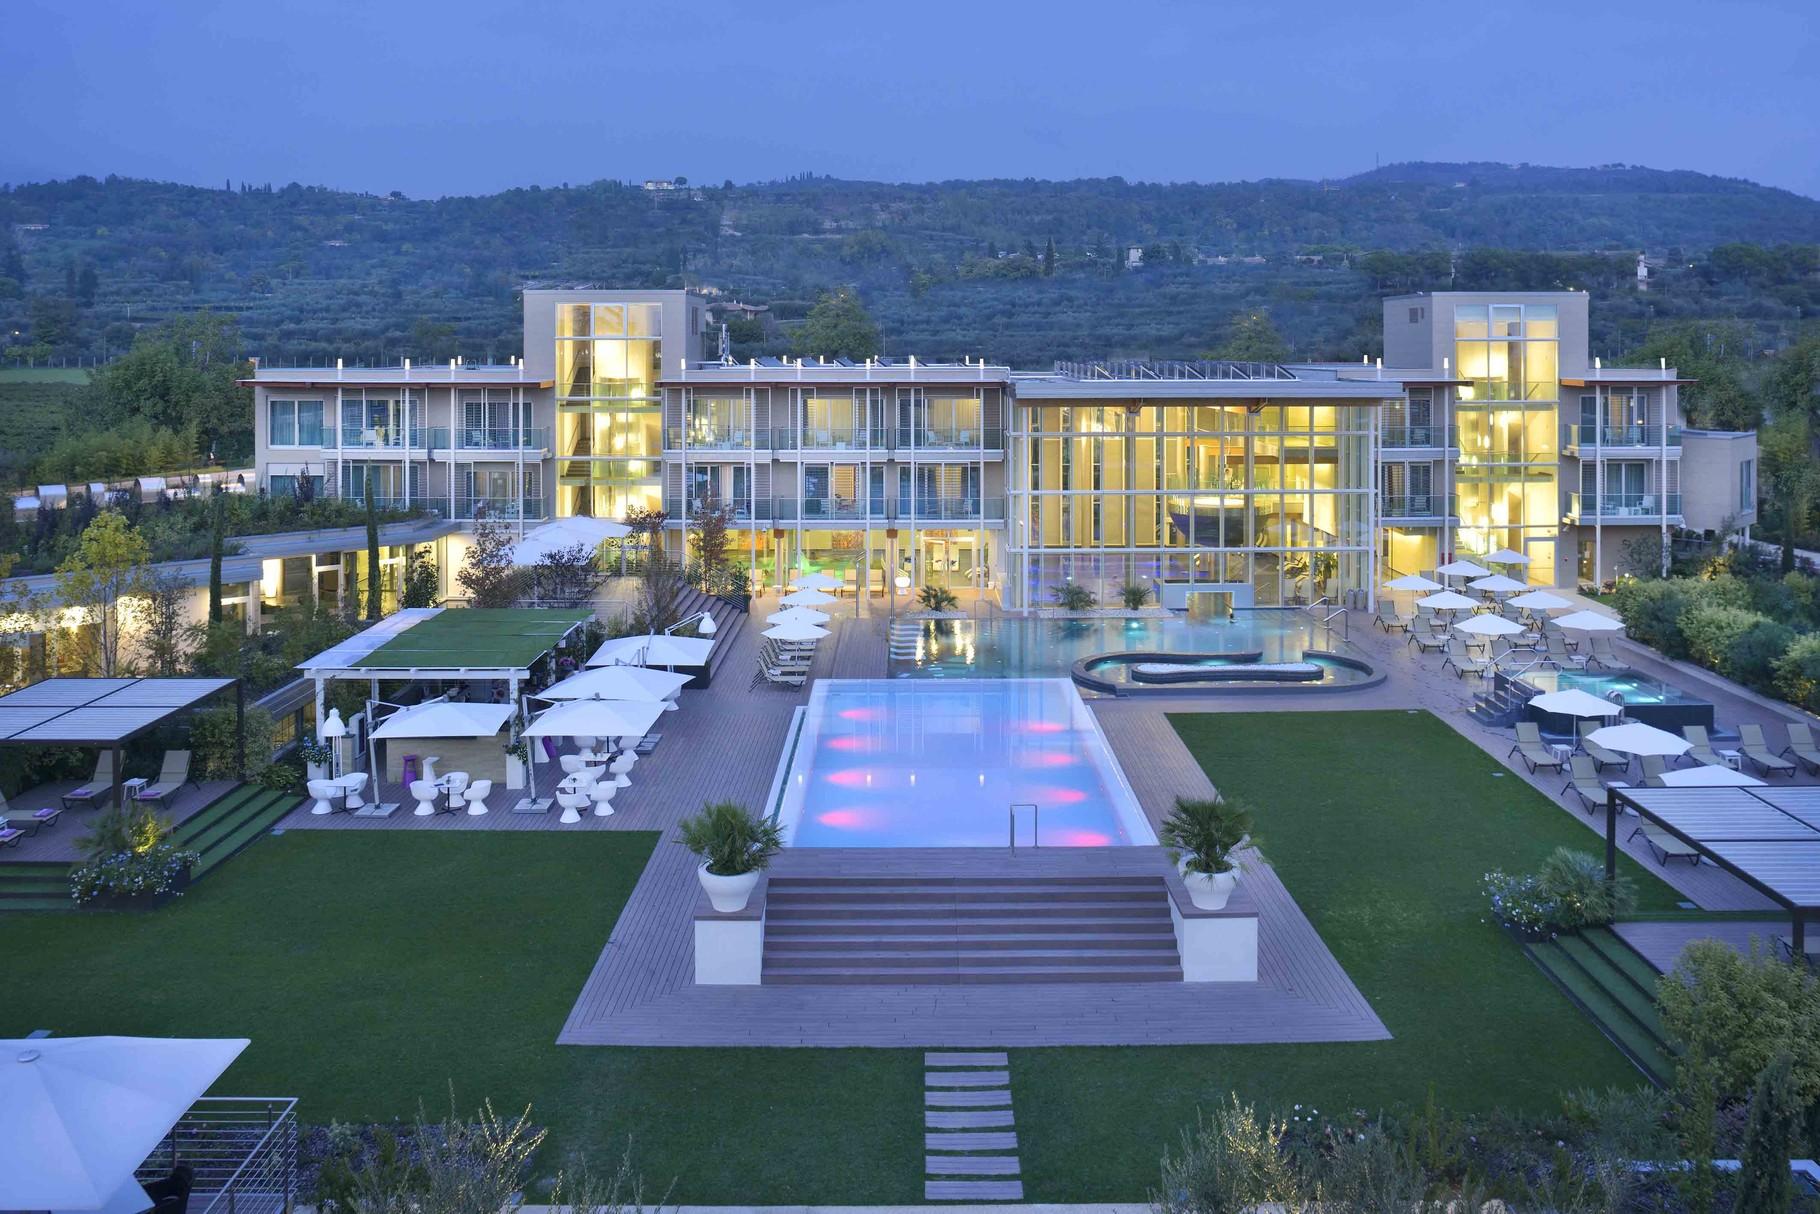 Aqualux Spa & Suite - modernes Wellnesshotel